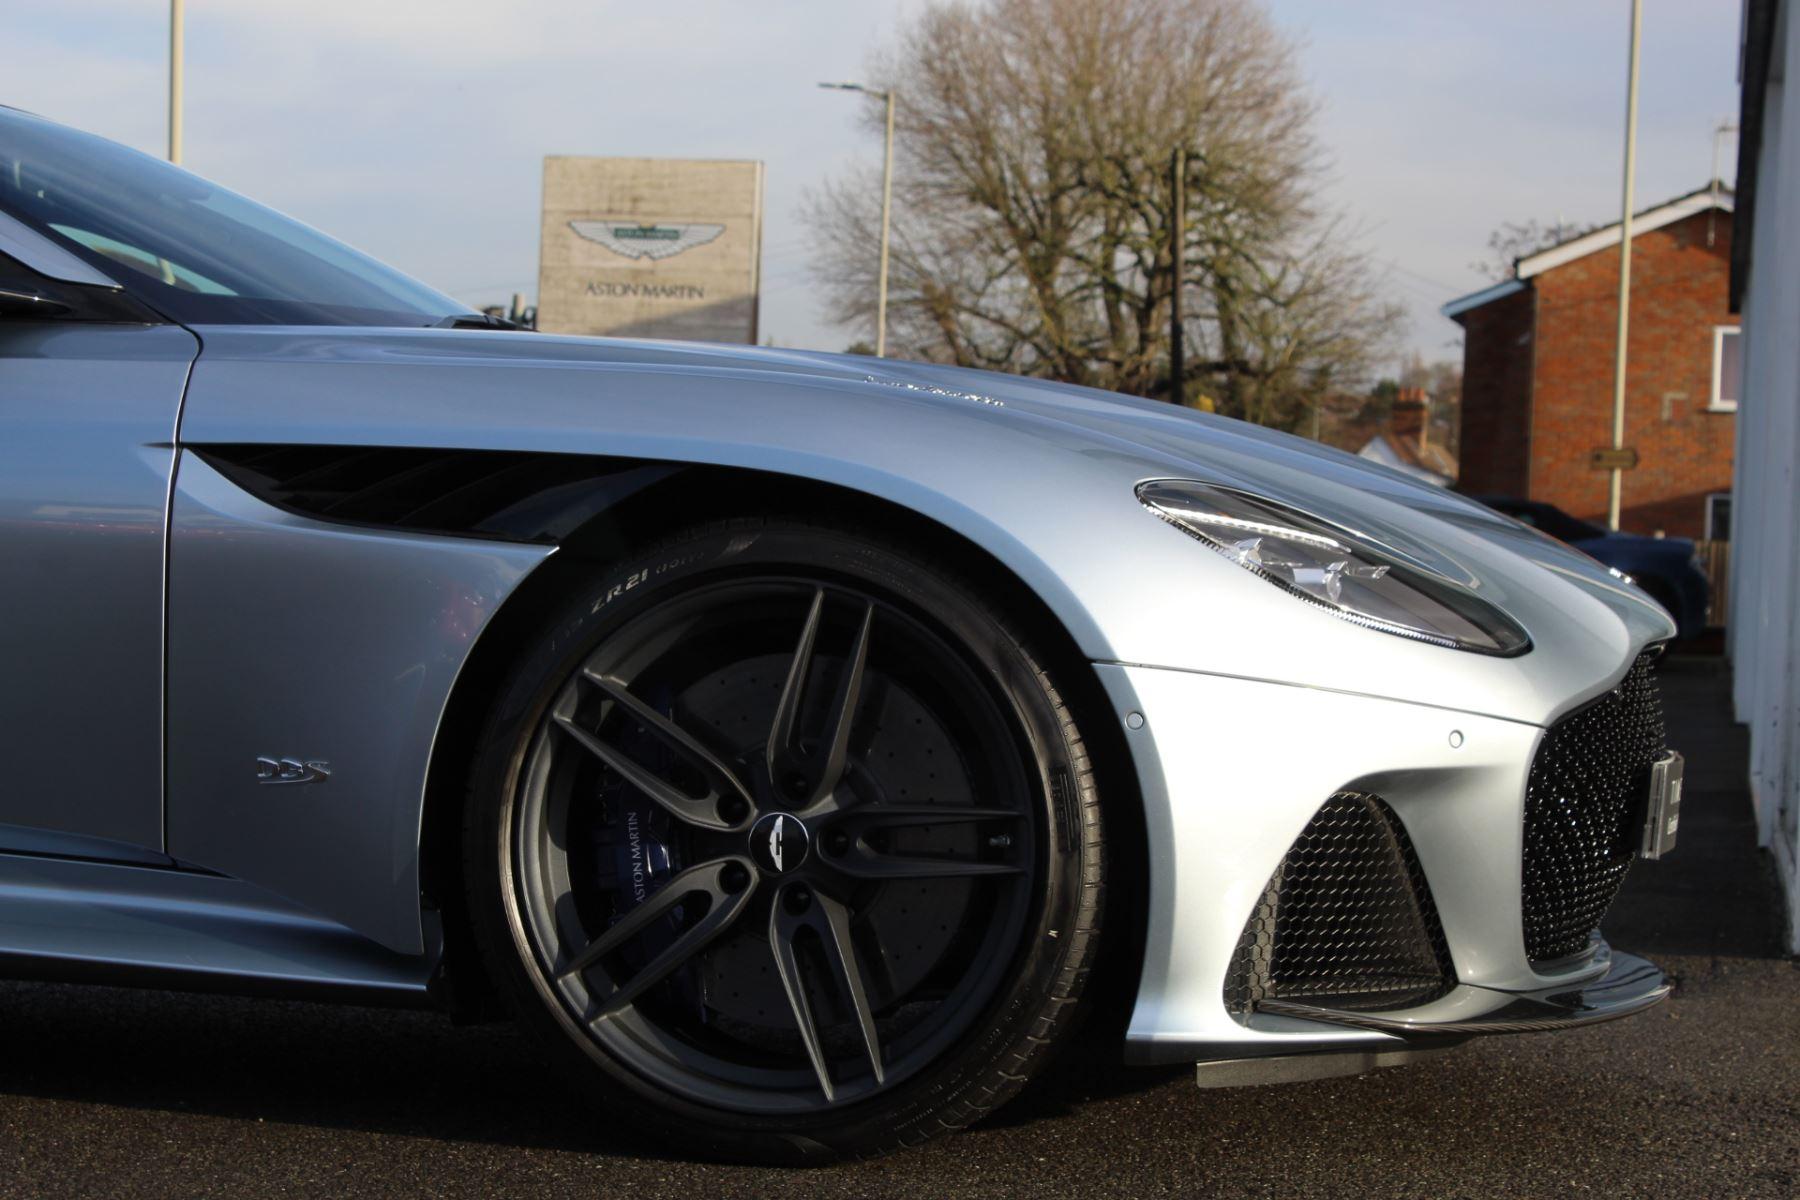 Aston Martin DBS Superleggera V12 2dr Touchtronic image 19